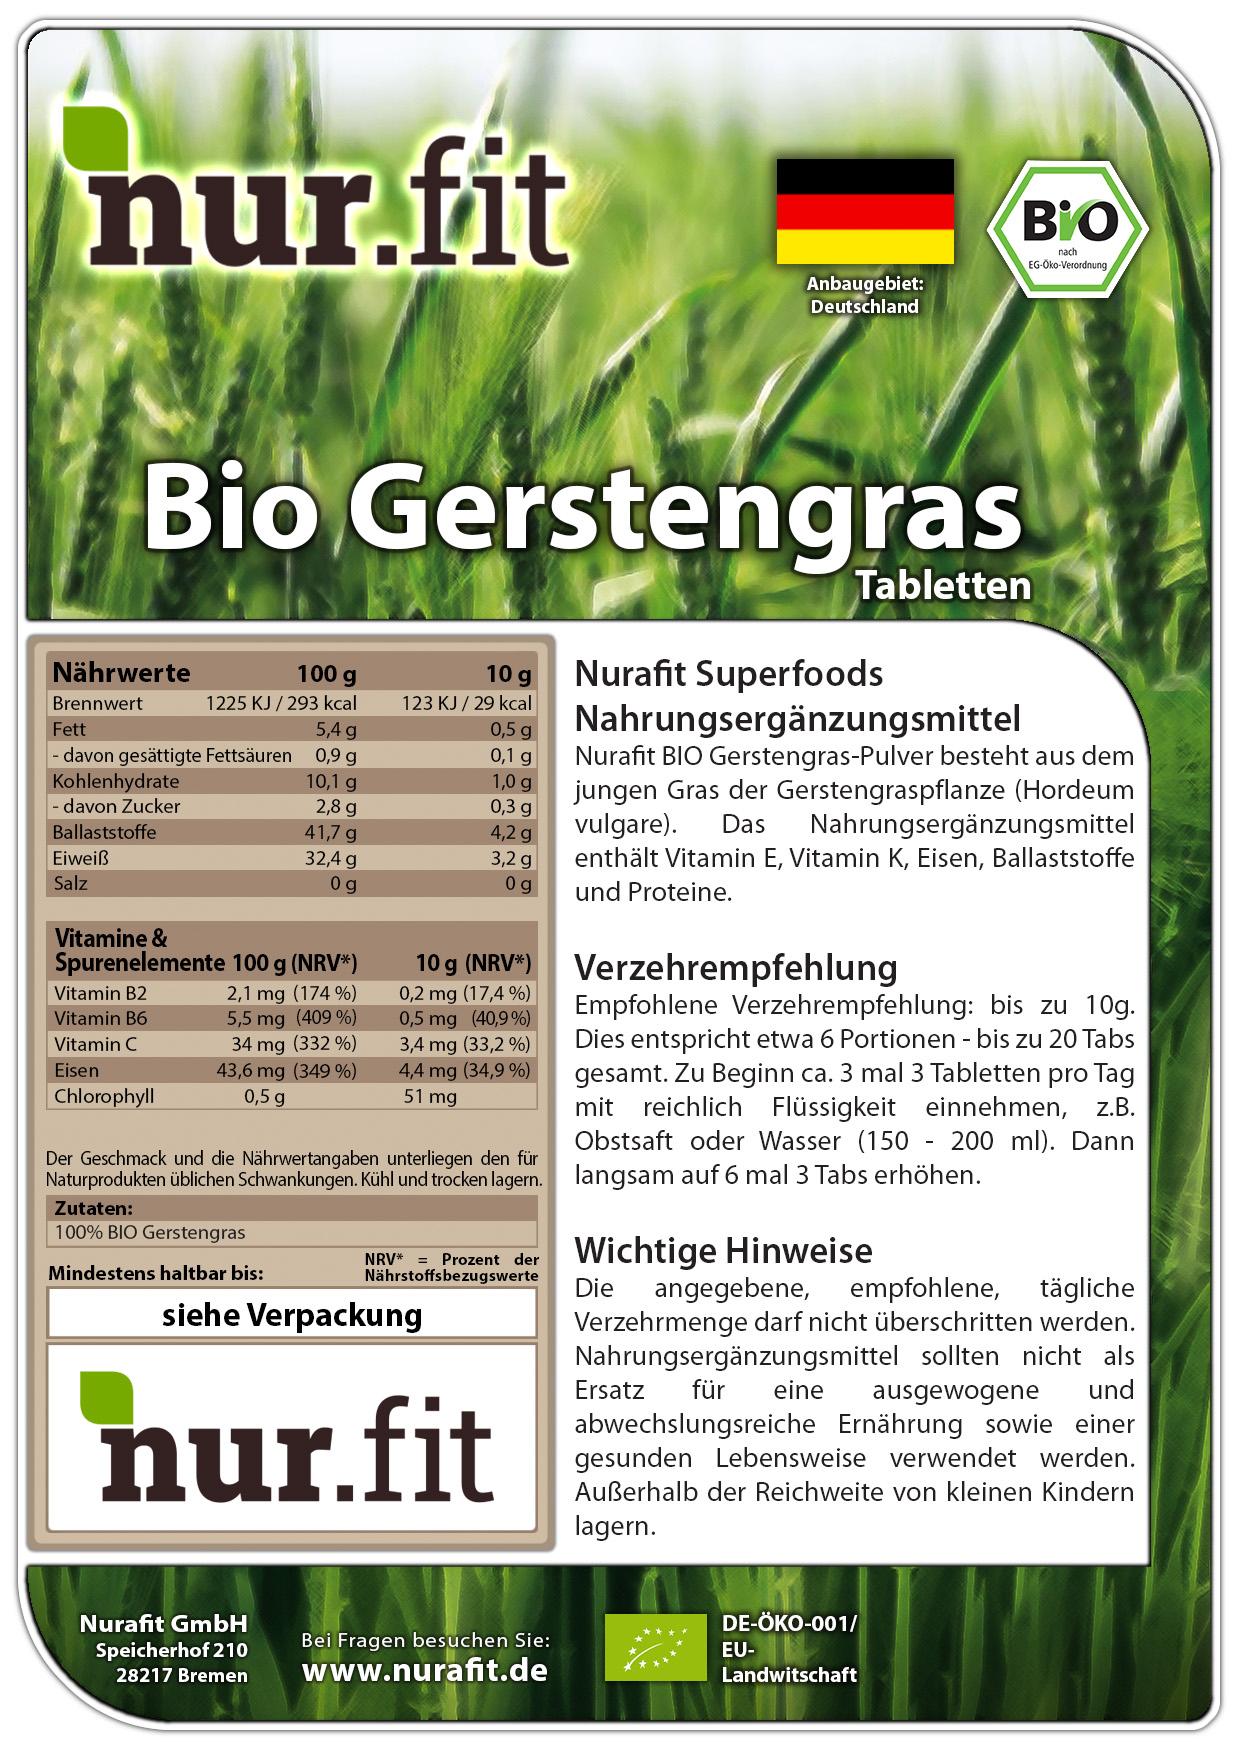 BIO Gerstengras Tabs